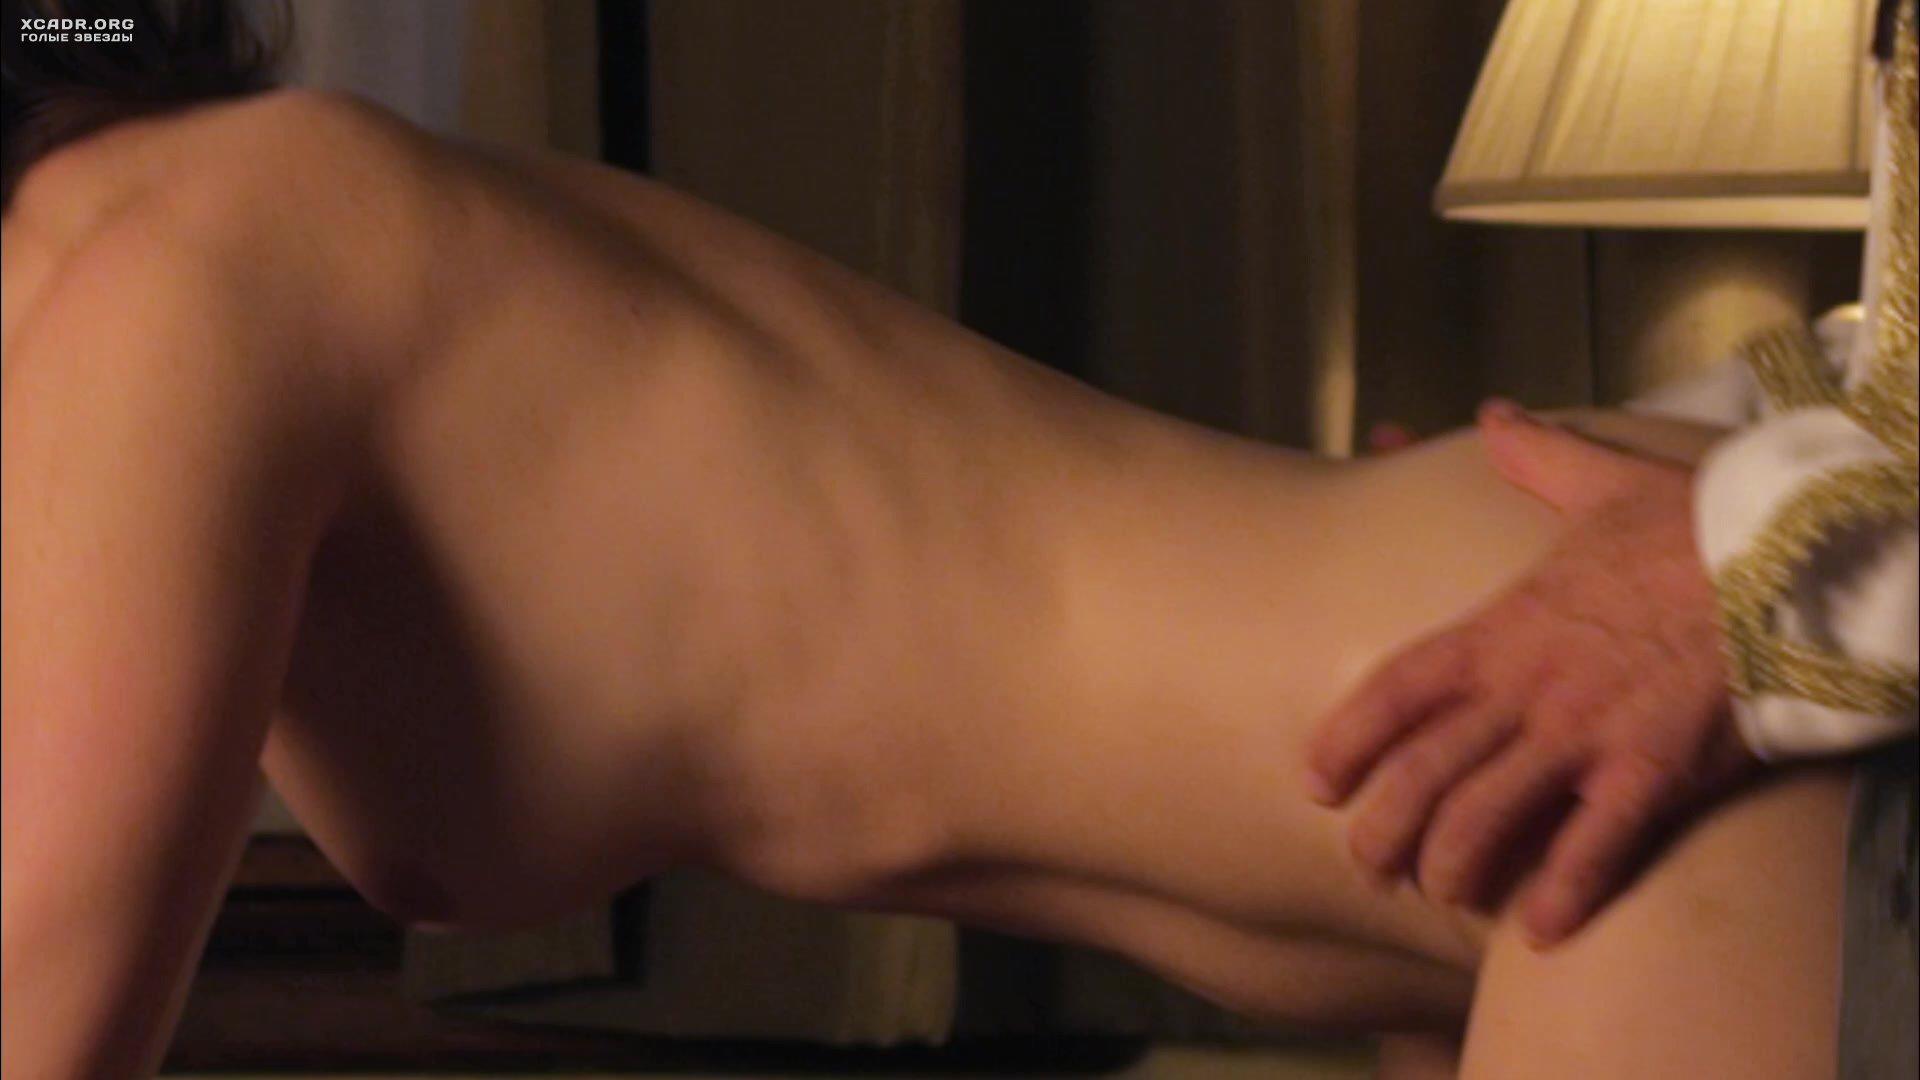 Секс С Хезер Руп – Пушки, Телки И Азарт (2011)